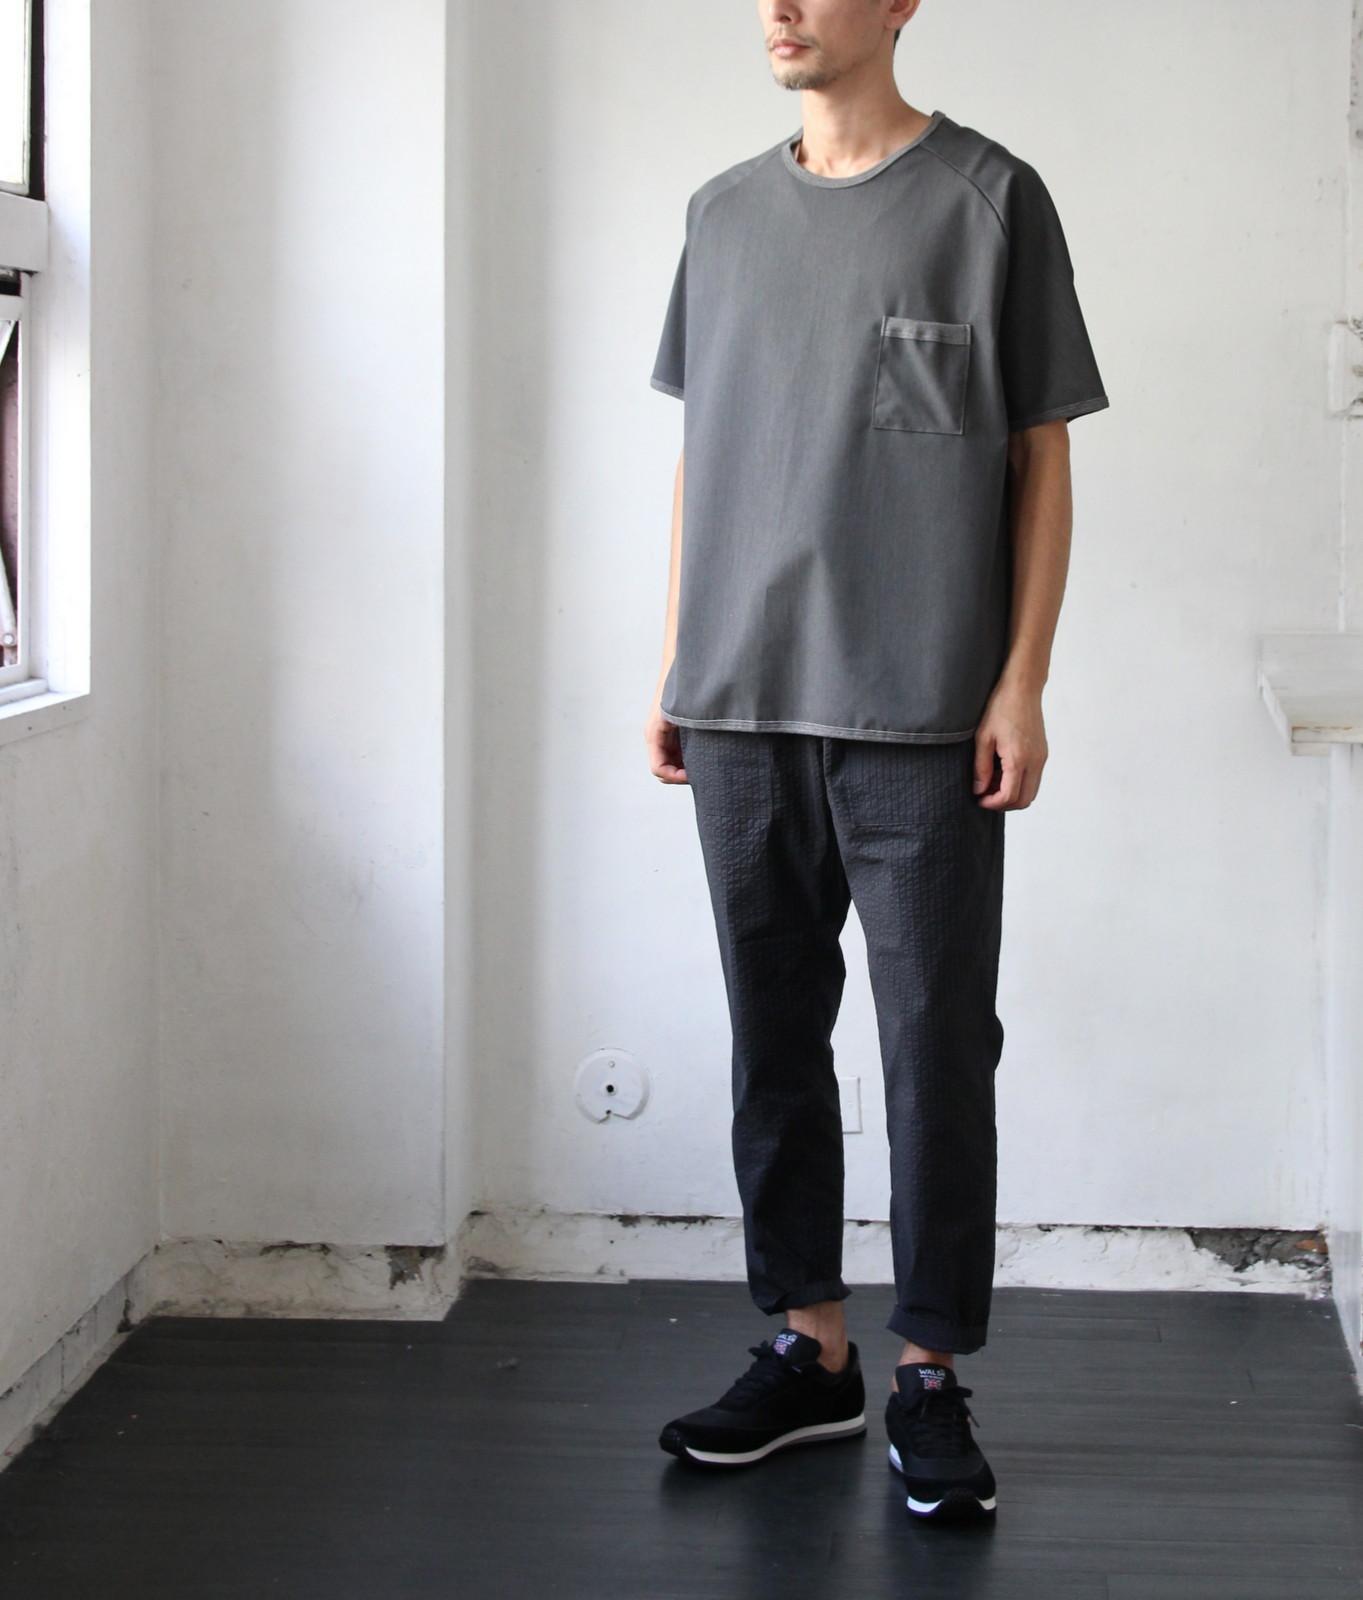 Tro Cool T-shirt_c0379477_20201656.jpg